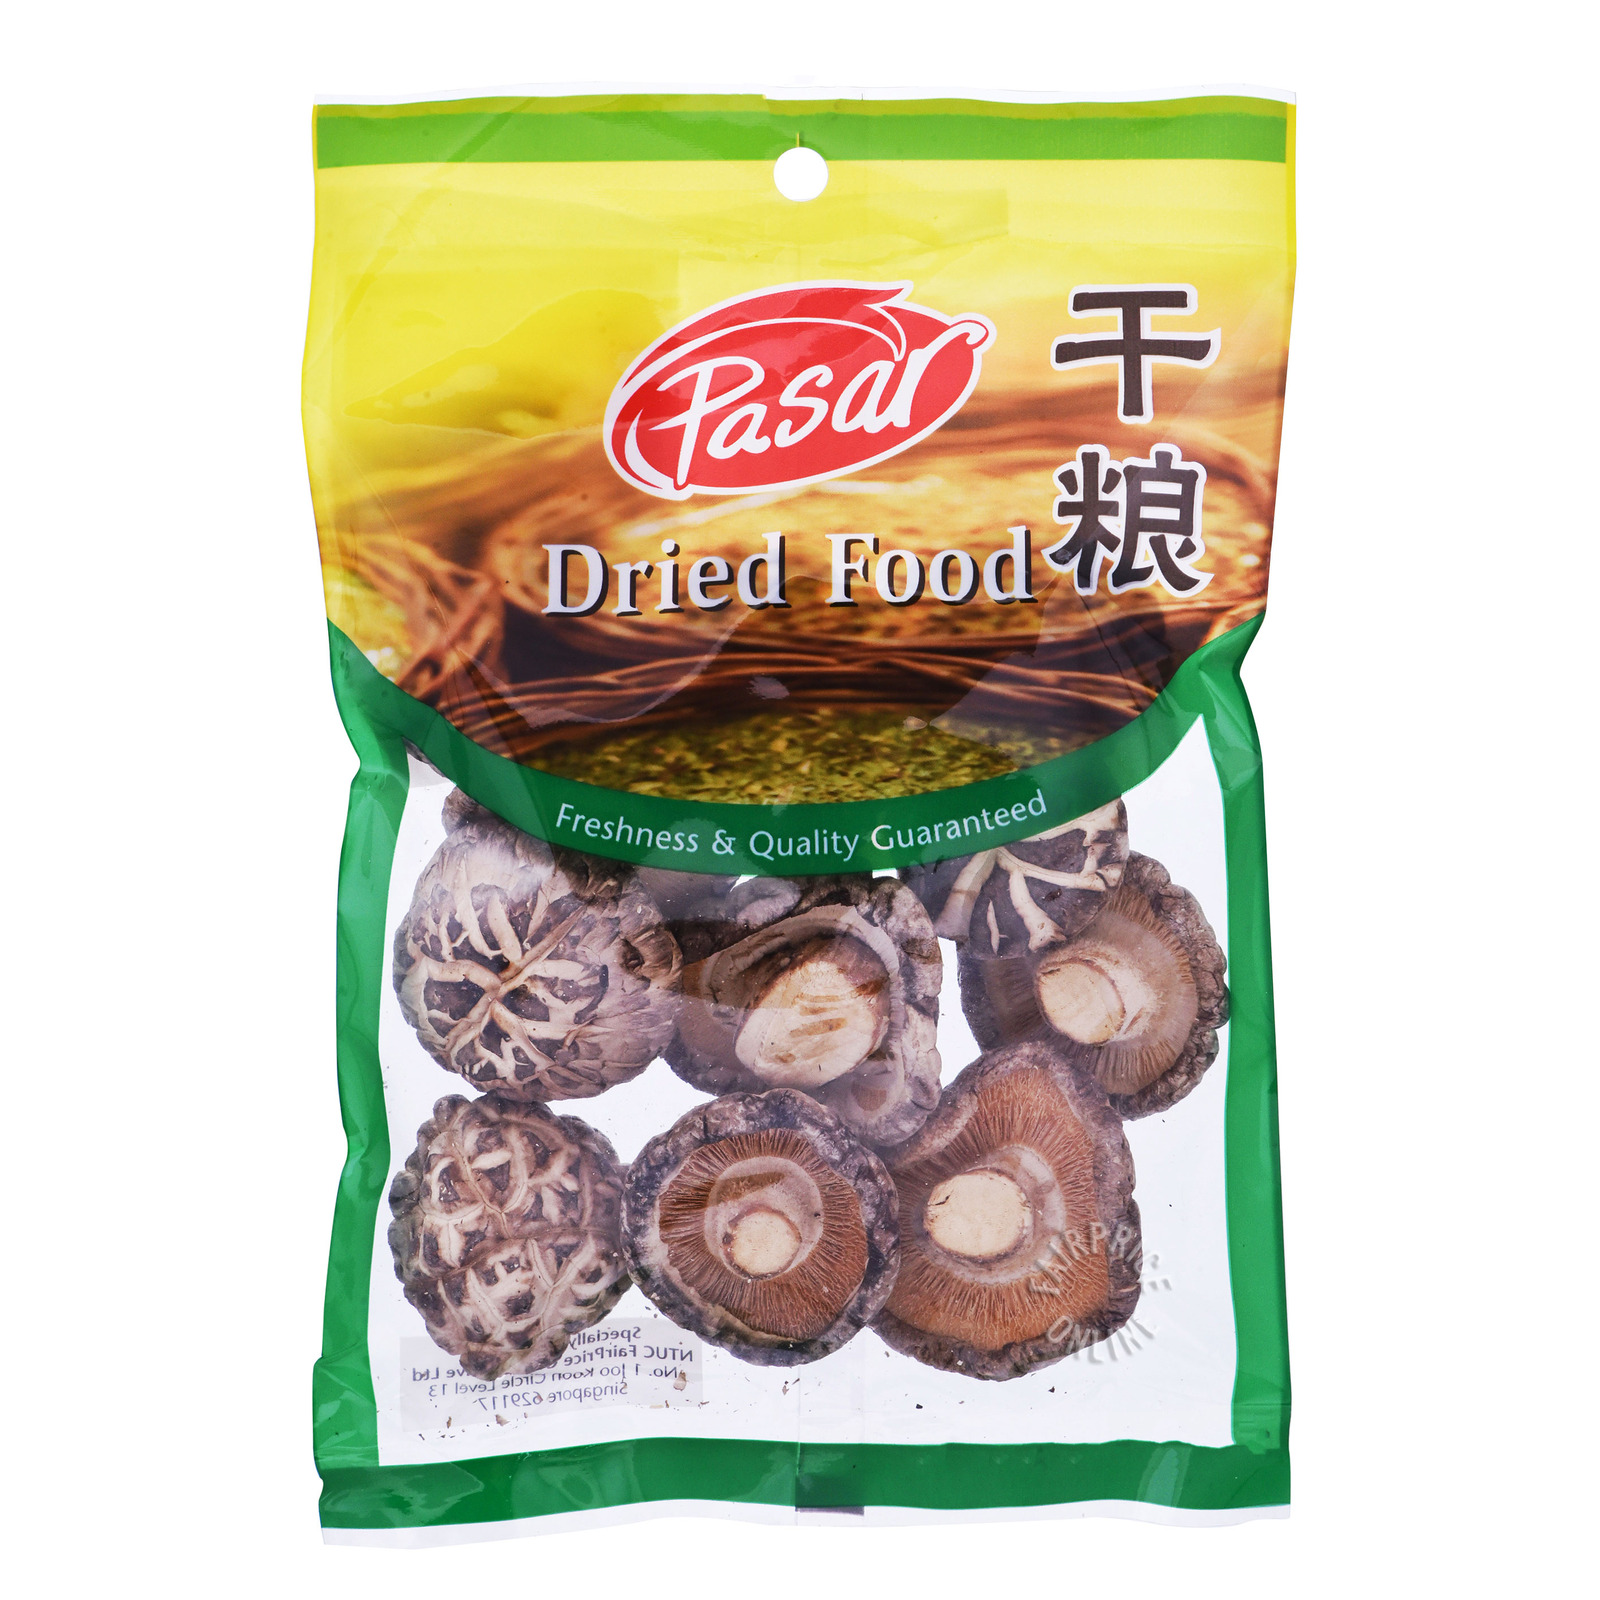 Pasar Japan Dried Mushroom